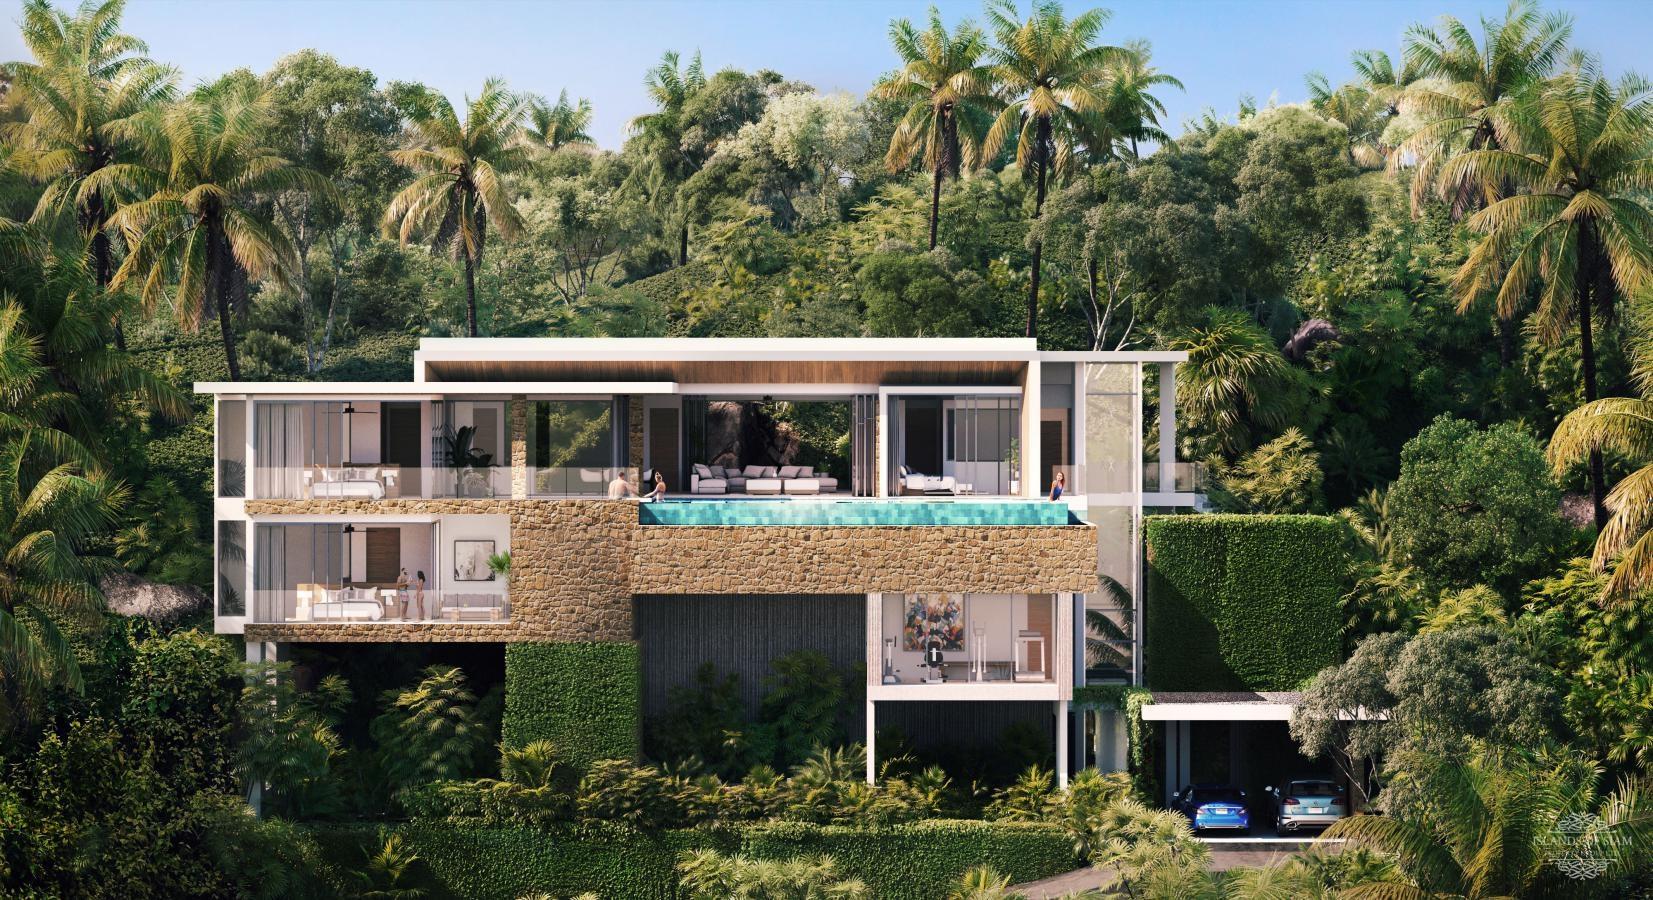 View - For Sale Sea View Land 420 Sqm In Lipa Noi - Koh Samui